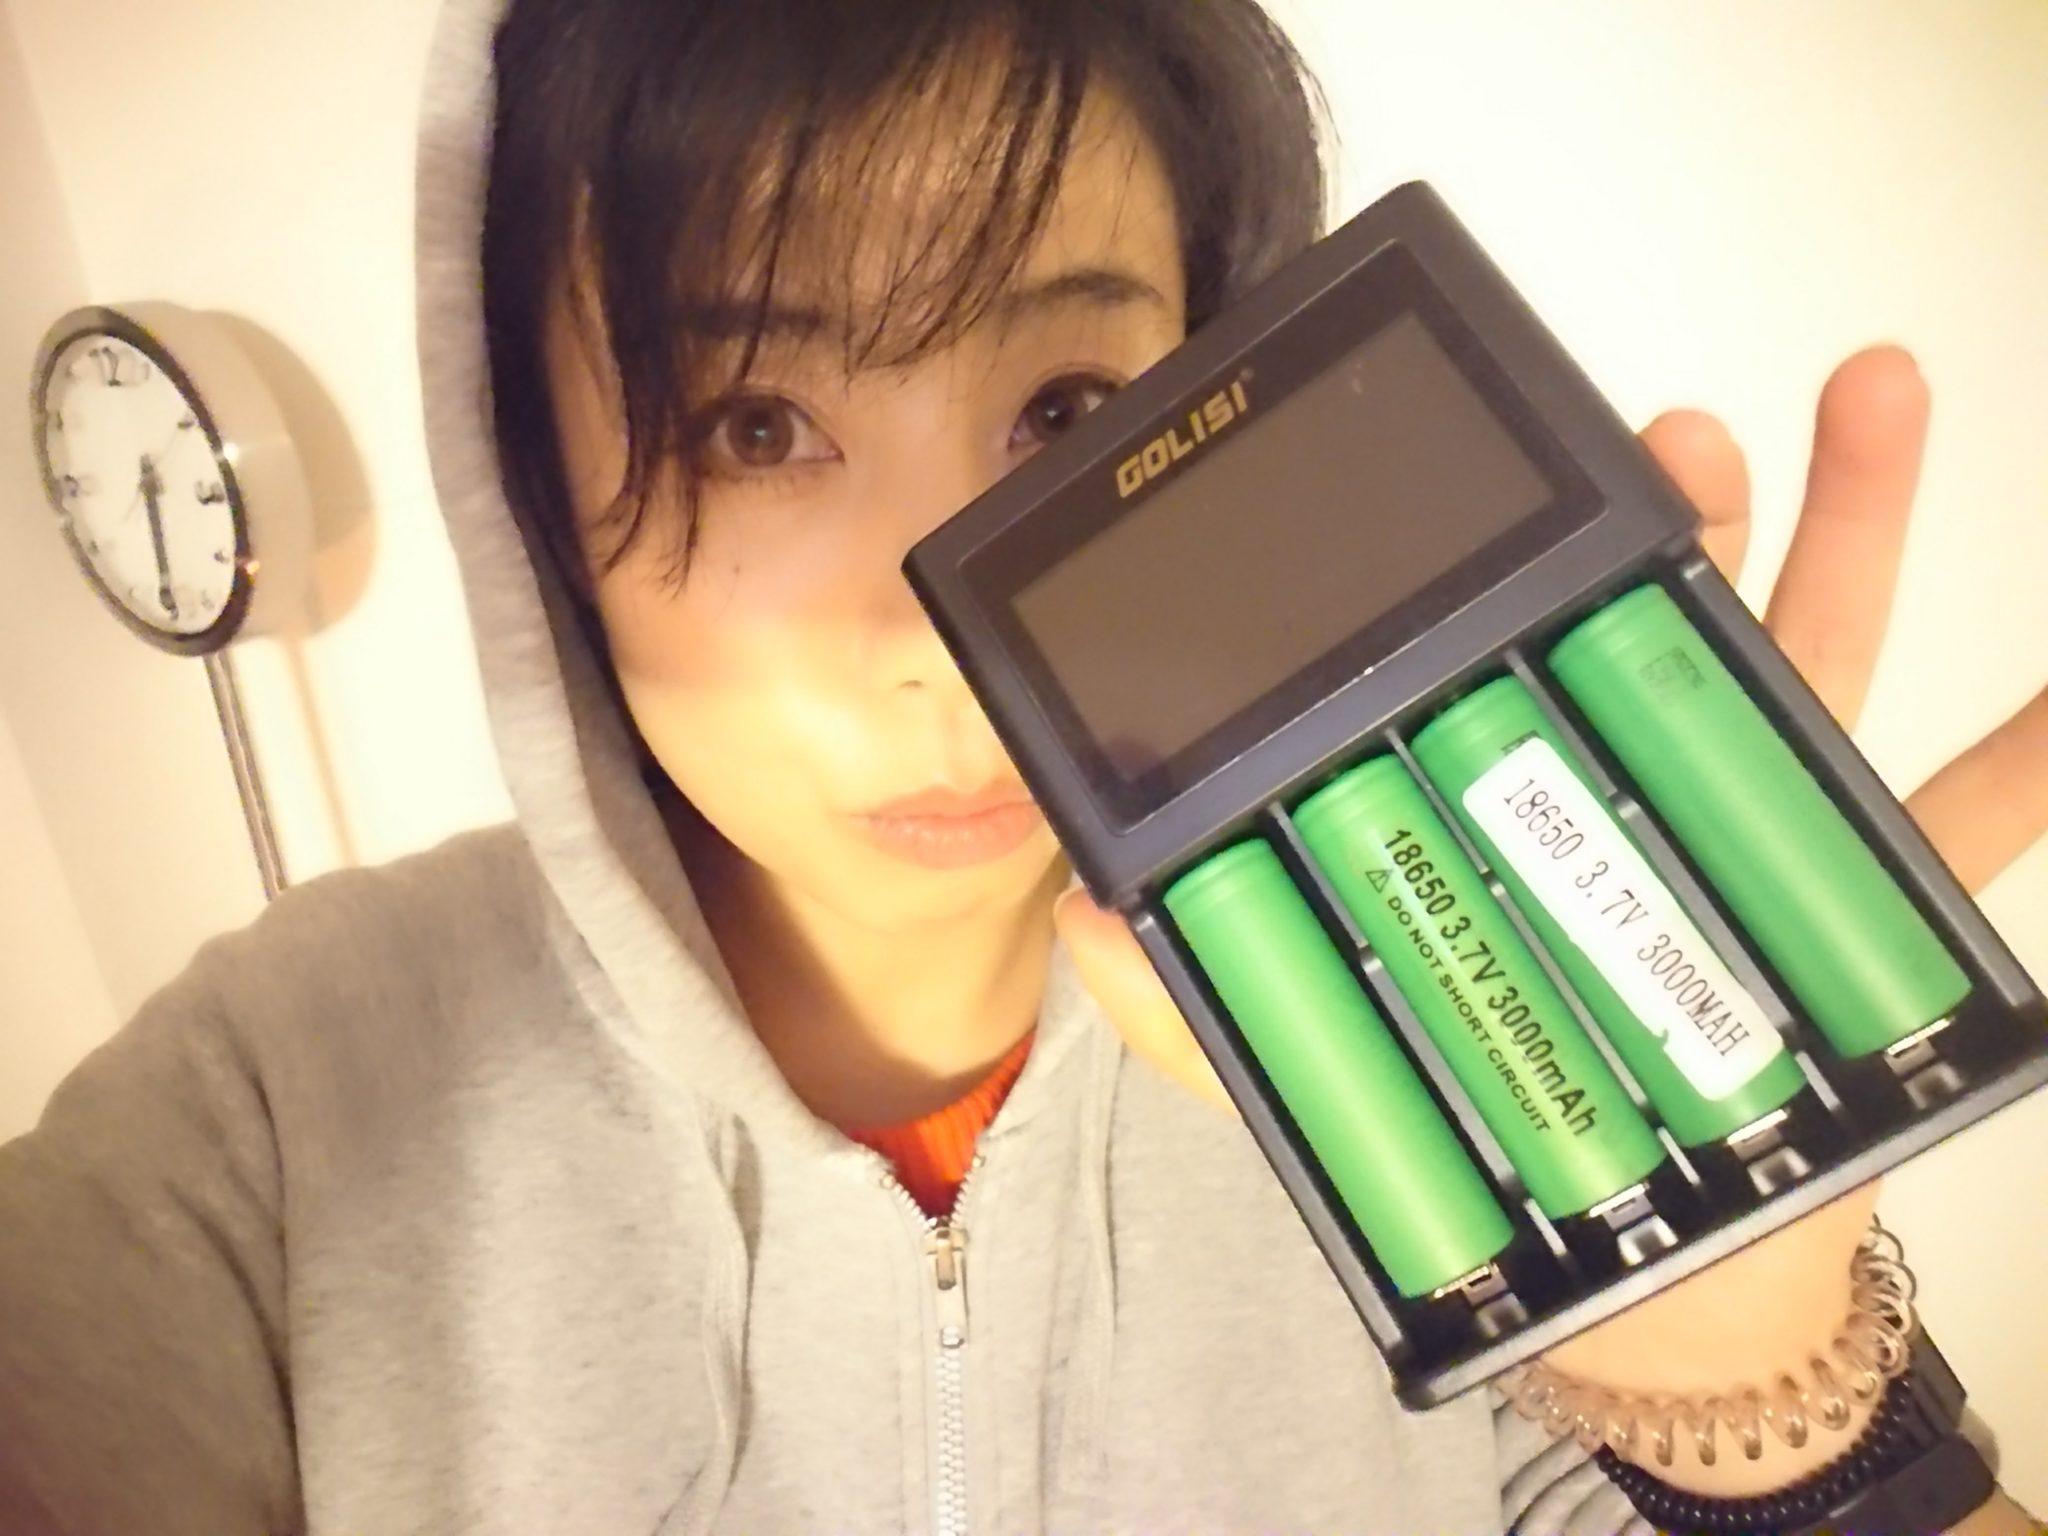 DSC 1790 - 【レビュー】Golisi S4バッテリーチャージャーの威力にエィミイ震える!!18650バッテリー4本充電可能【VAPEガールズ】